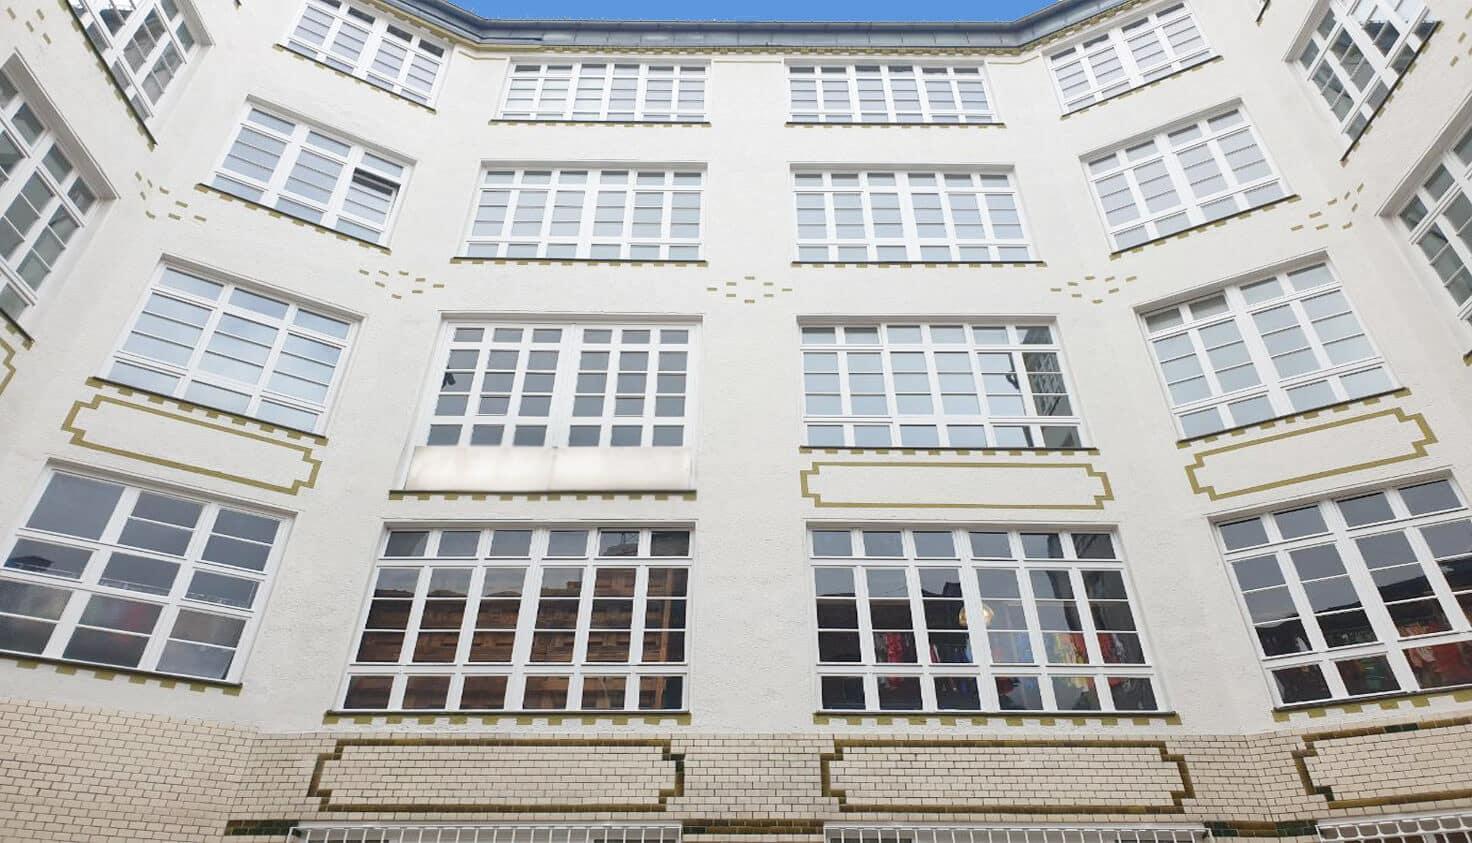 00-Cover-Fassade-referenz-malerbetrieb-kluge-berlin-1..jpg